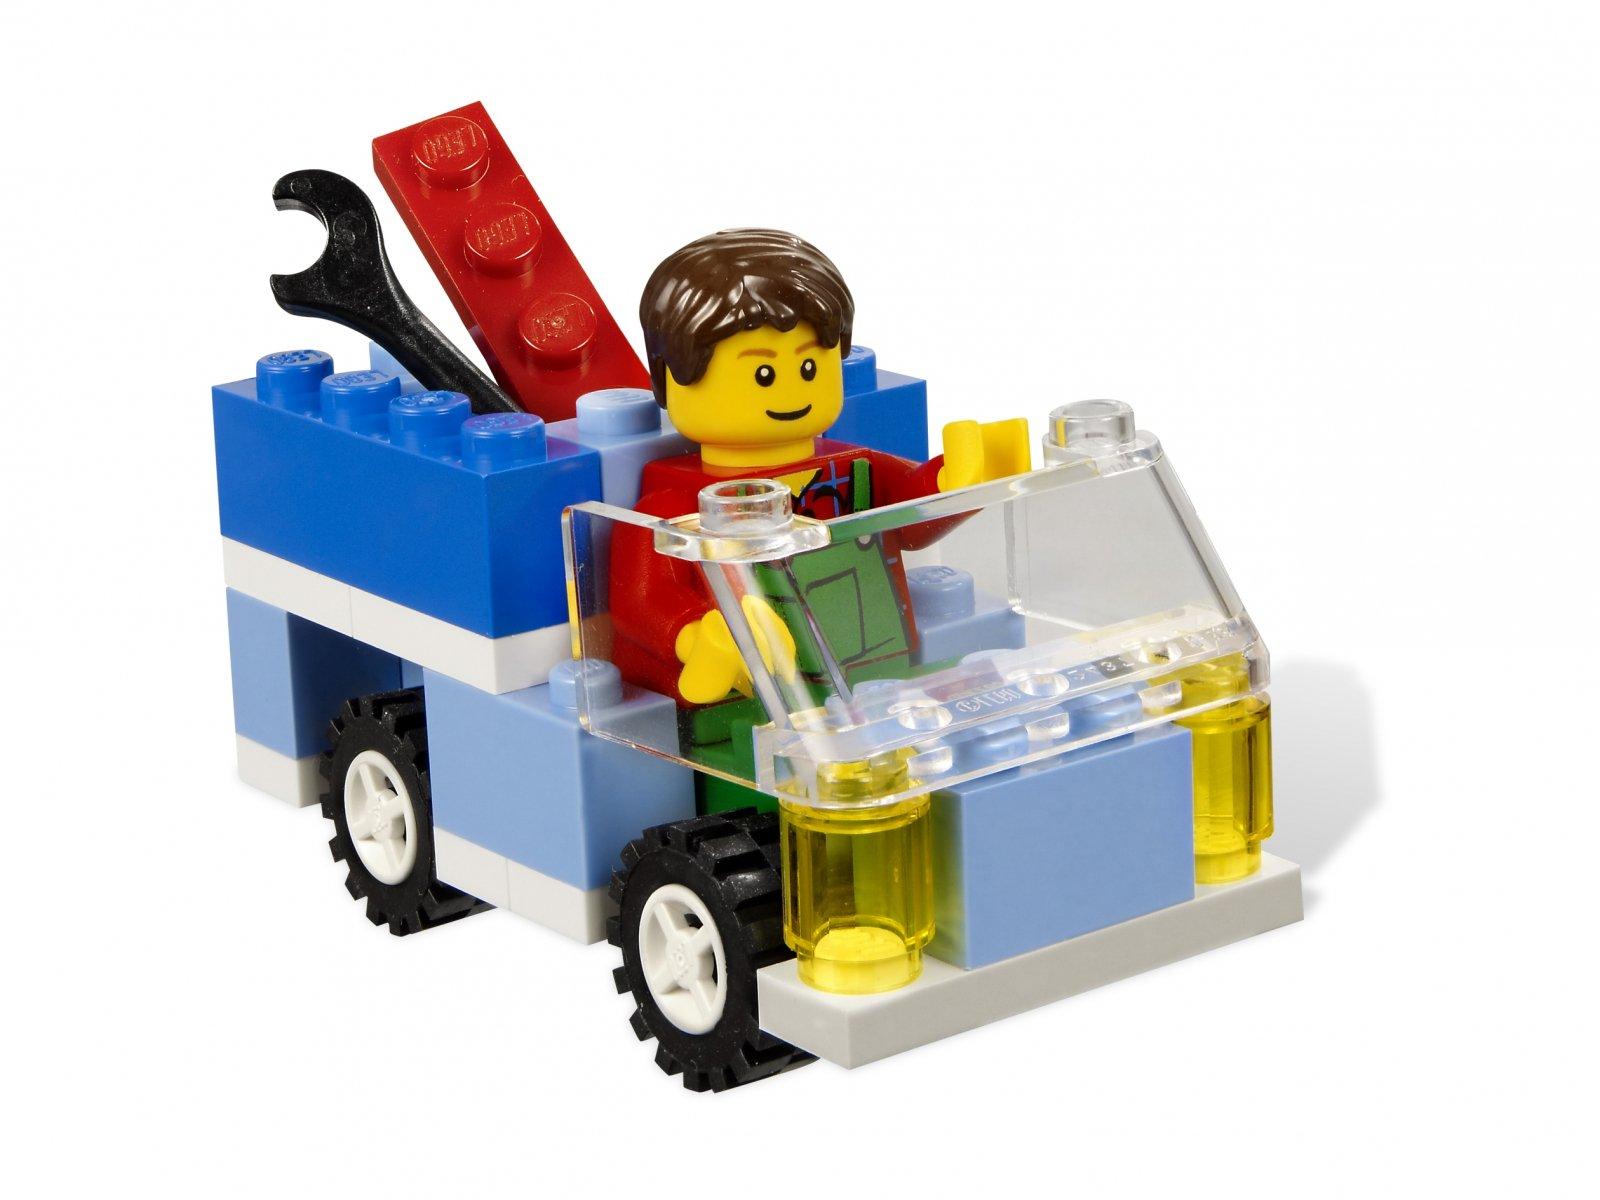 LEGO Bricks & More Zestaw do budowy domu 5899